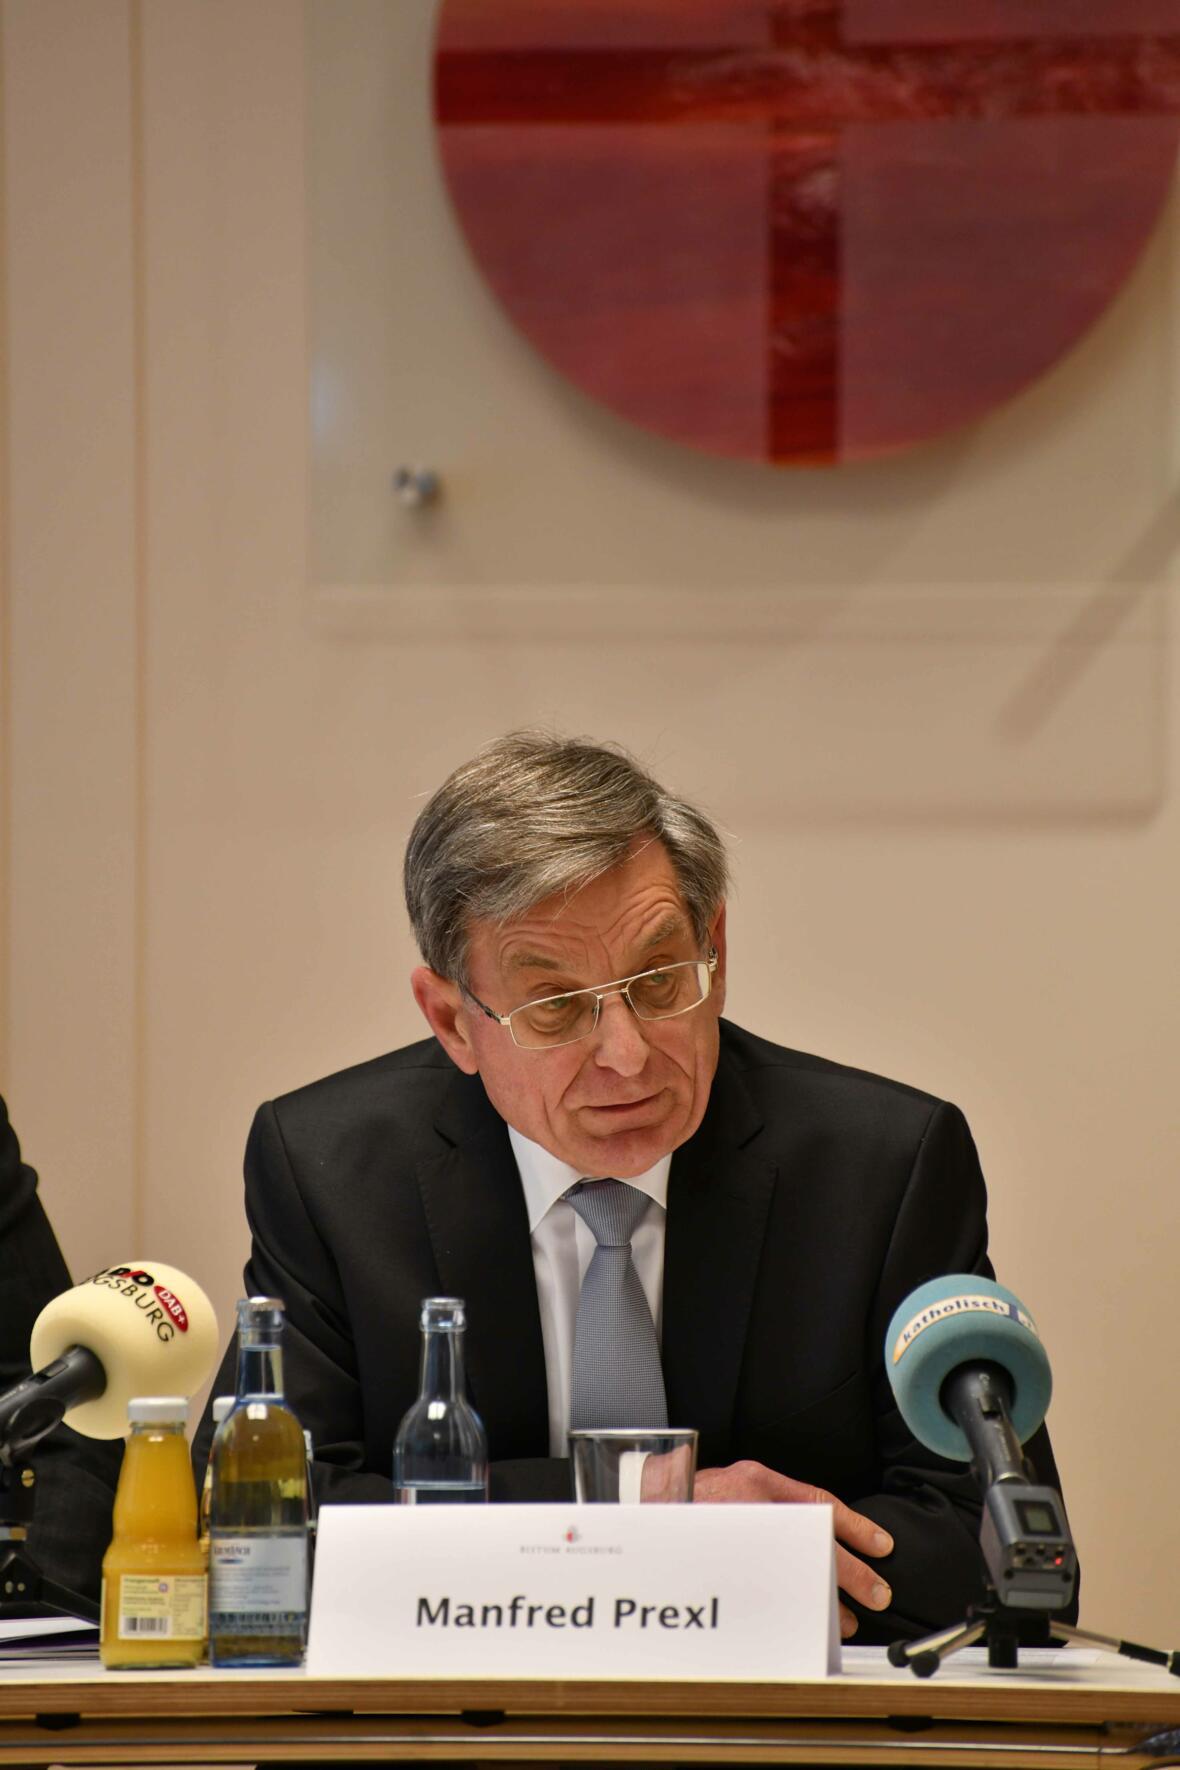 Leiter der Projektgruppe: Richter i.R. Manfred Prexl. (Foto: Daniel Jäckel / pba)